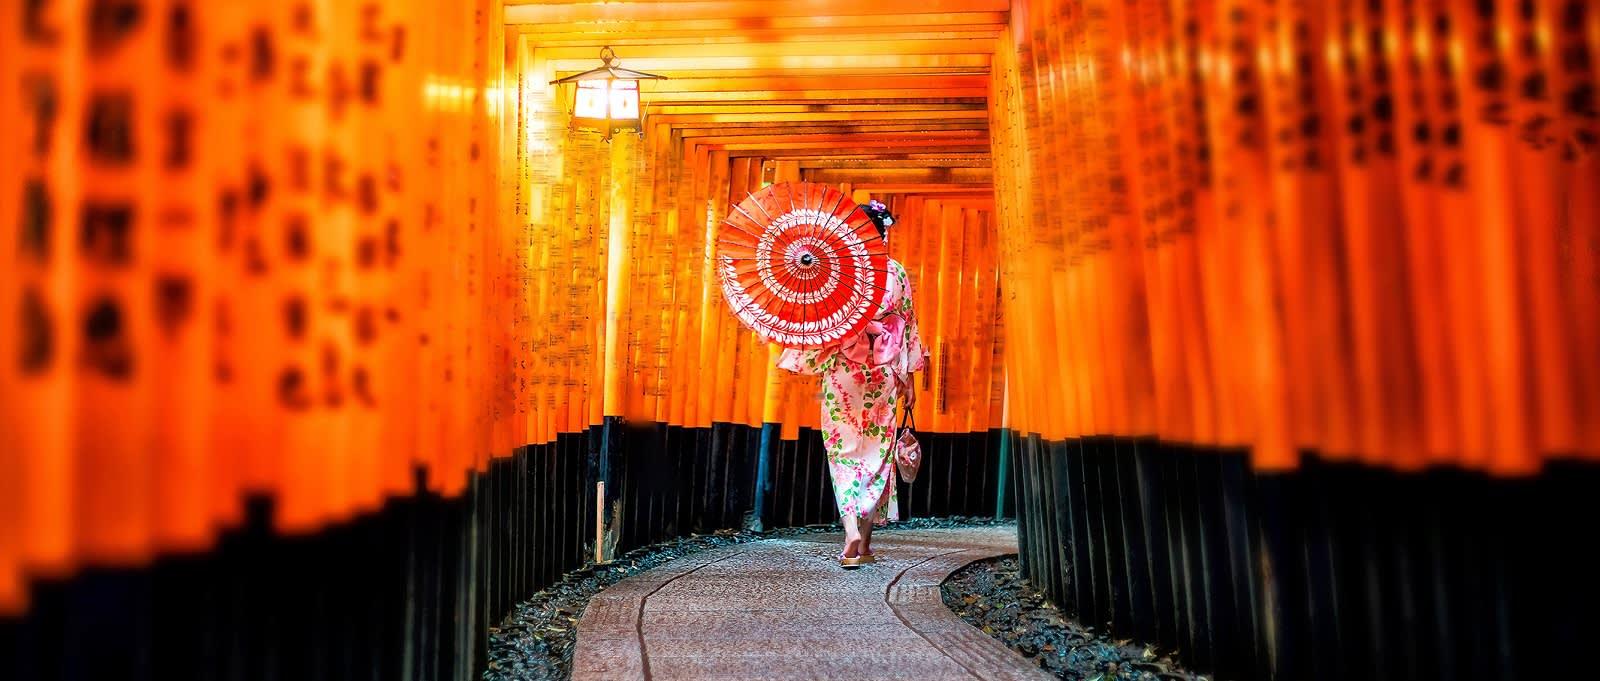 Japanese girl in Yukata with red umbrella at Fushimi Inari shrine in Kyoto, Japan: best time to visit Japan